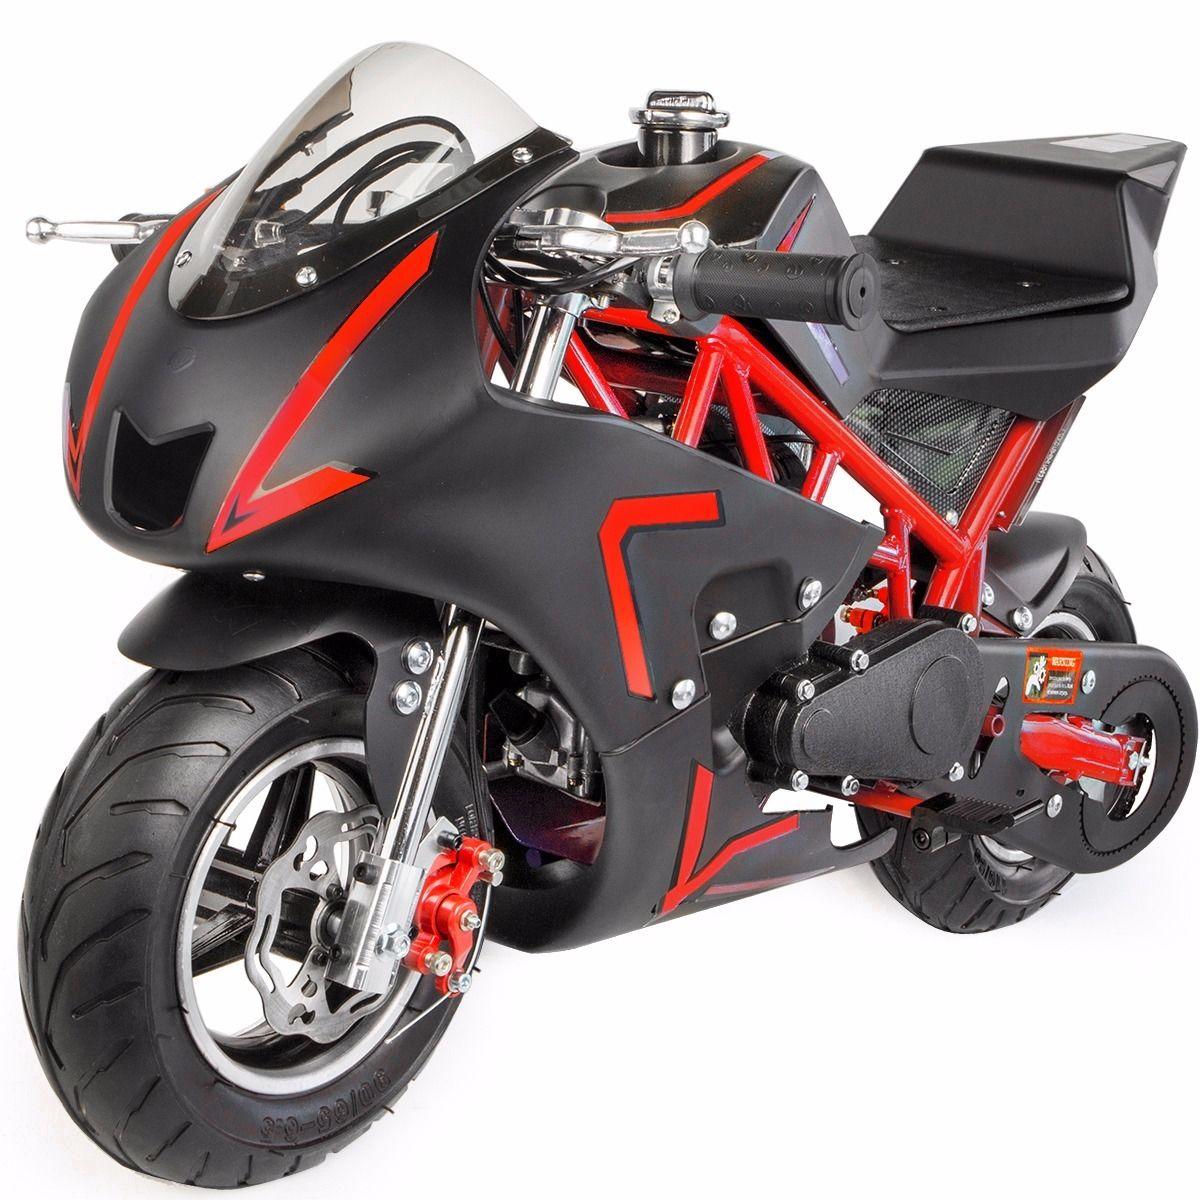 XtremepowerUS-Gas-Pocket-Bike-Motor-Bike-Scooter-40cc-Epa-Engine-Motorcycle thumbnail 23